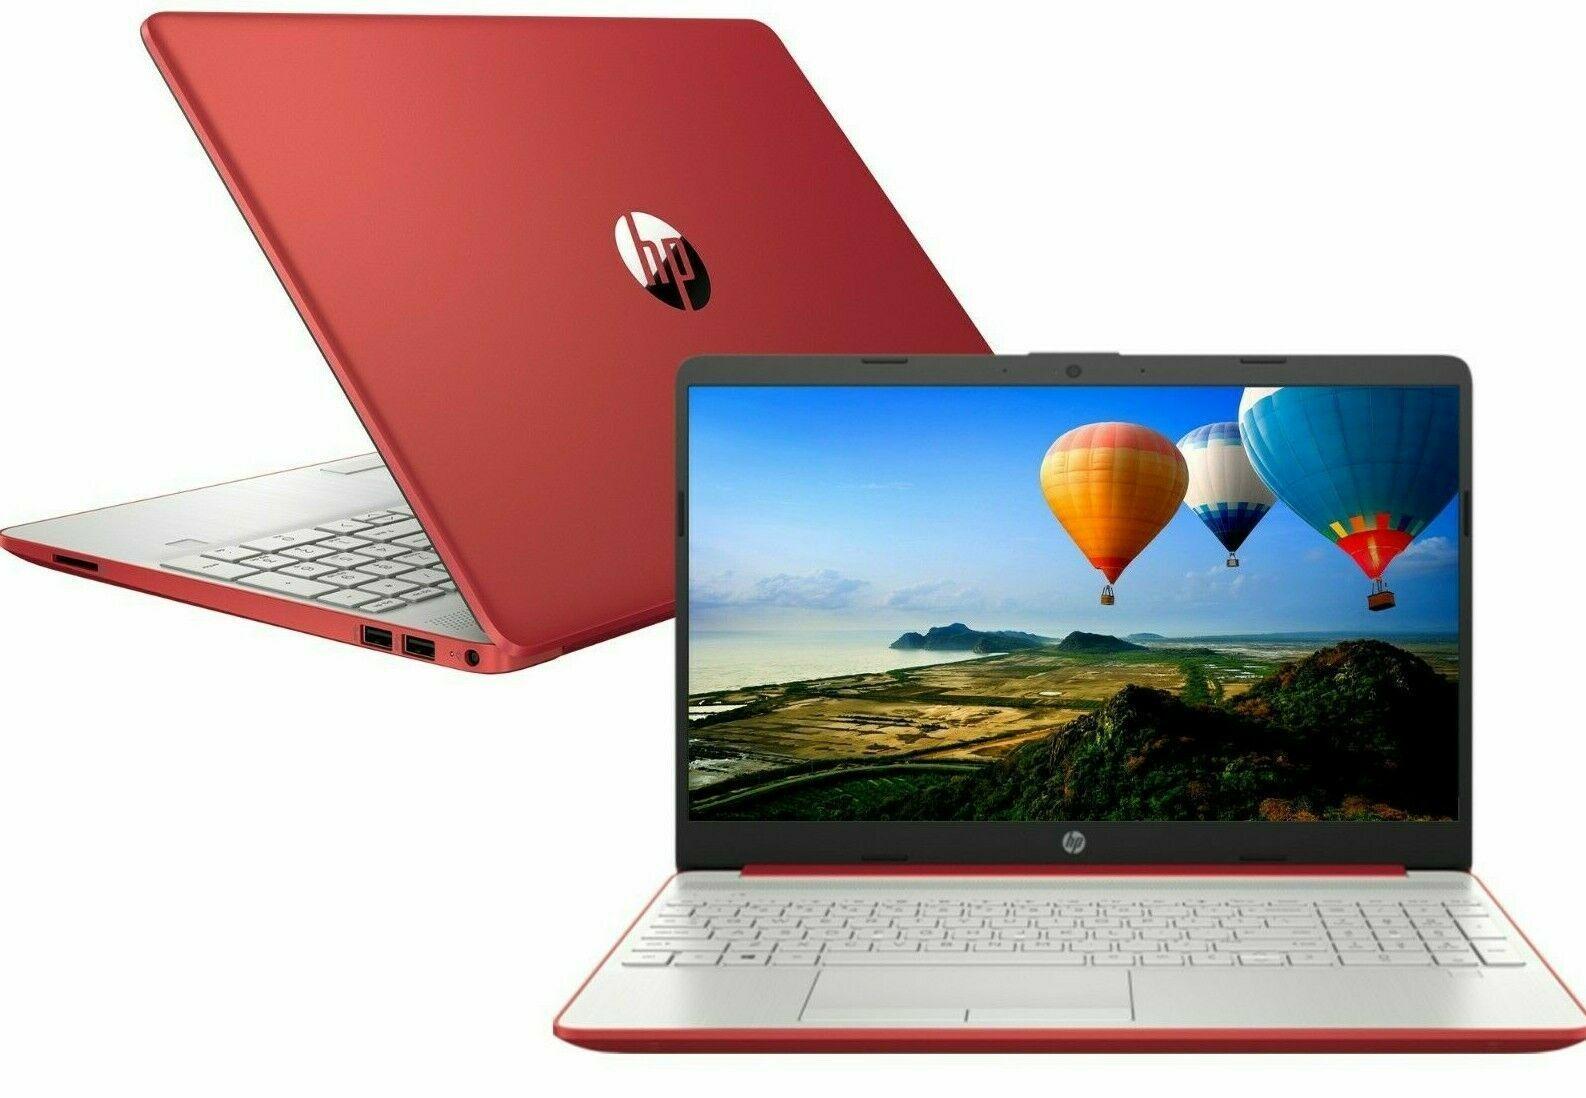 "Laptop Windows - NEW HP 15.6"" HD Red Laptop Intel Dual Core 2.4GHz 4GB RAM Webcam Windows 10"